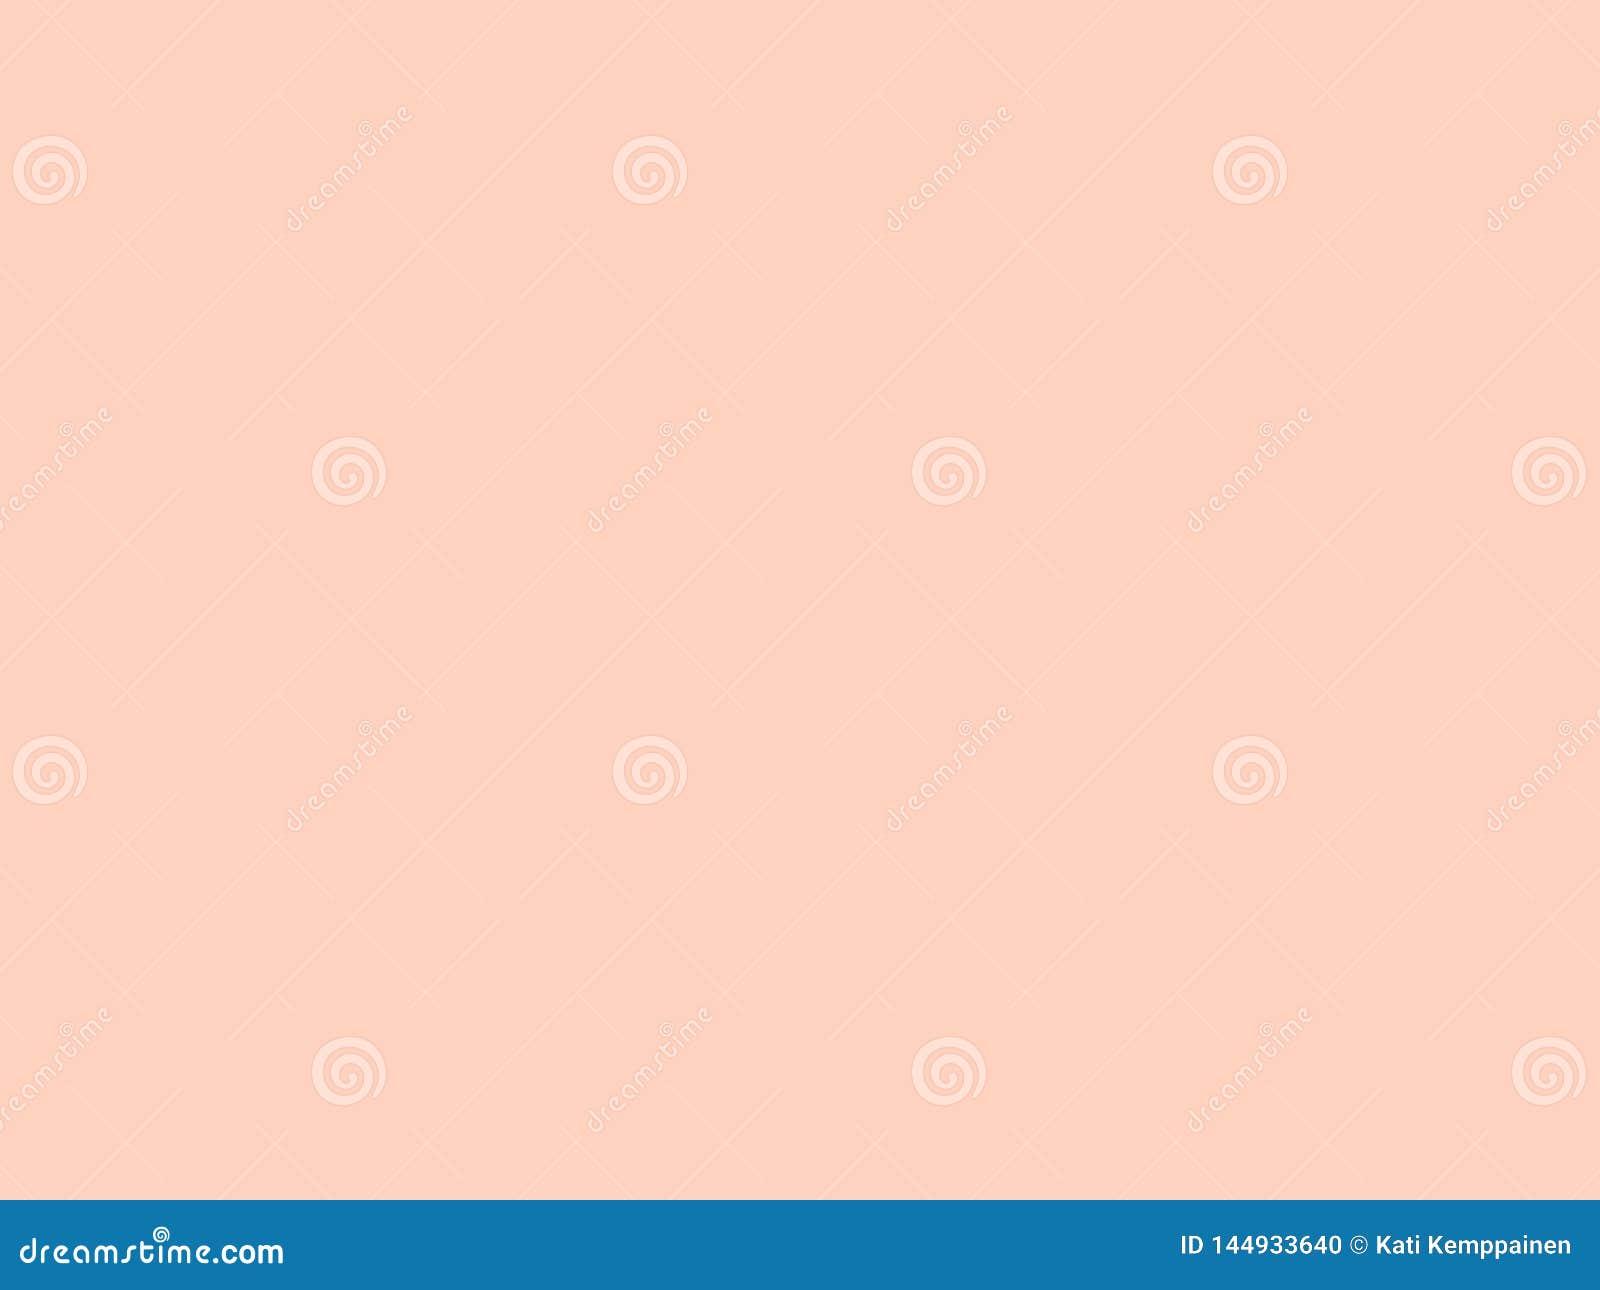 Plain Apricot Background Light Pink Wallpaper Stock Photo Image